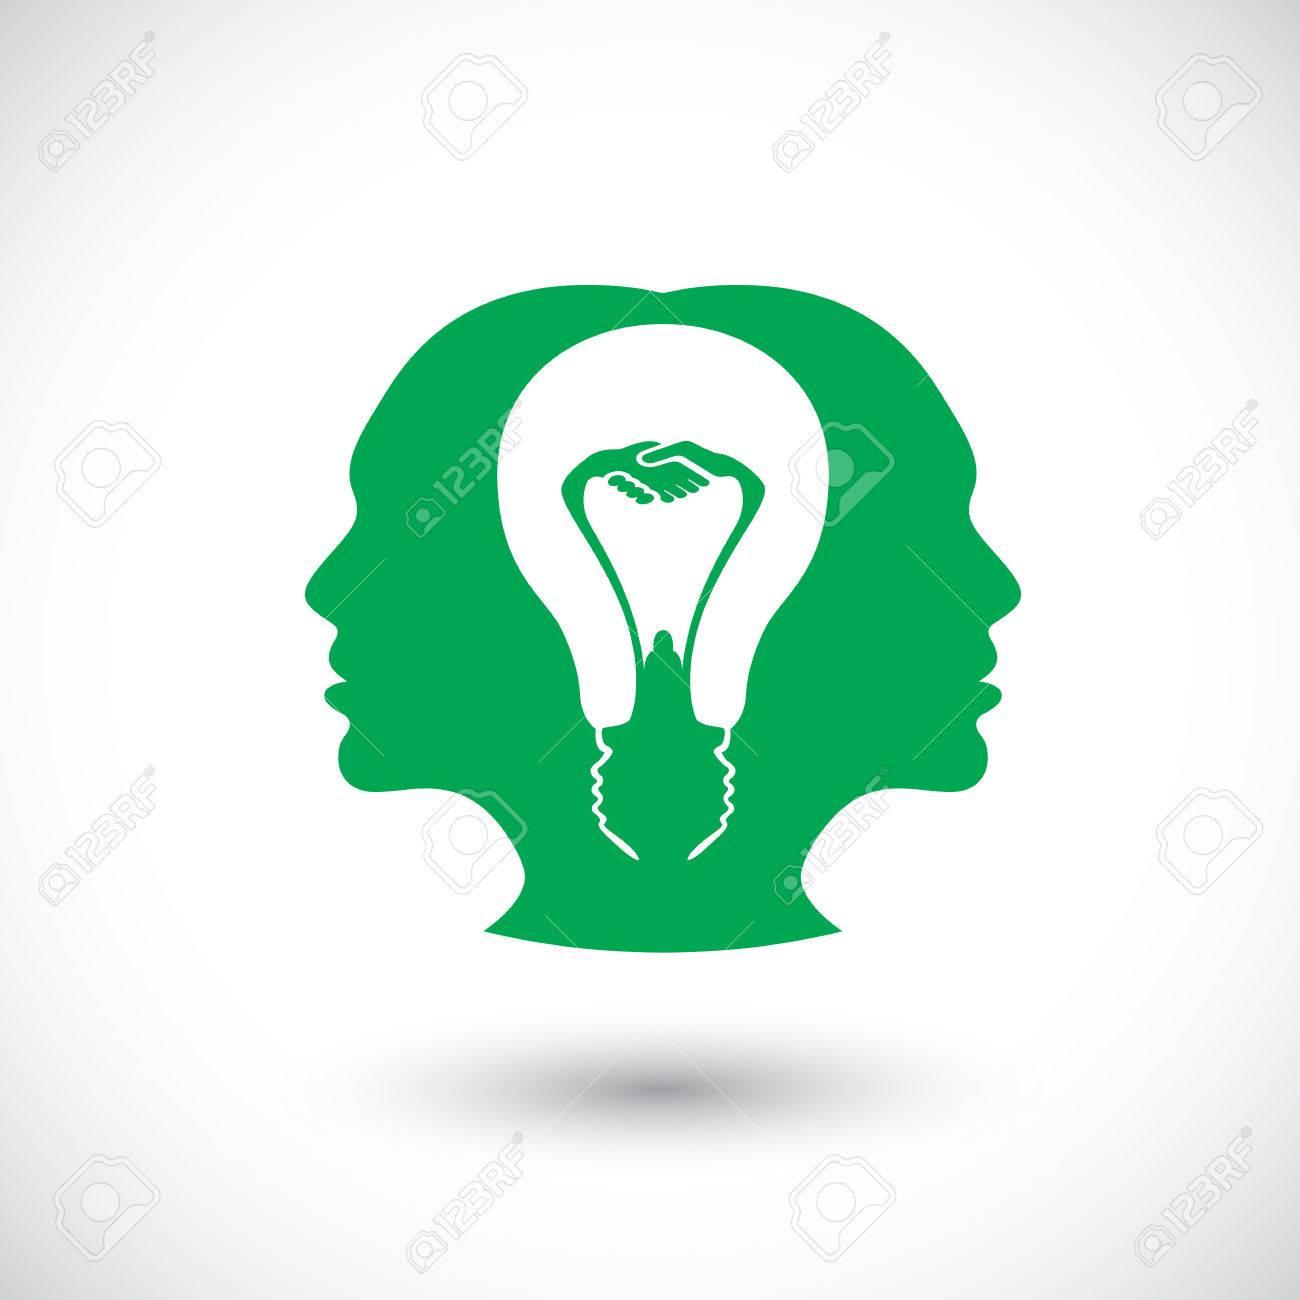 Symbol of thinking idea together brainstorm royalty free cliparts symbol of thinking idea together brainstorm stock vector 32481002 biocorpaavc